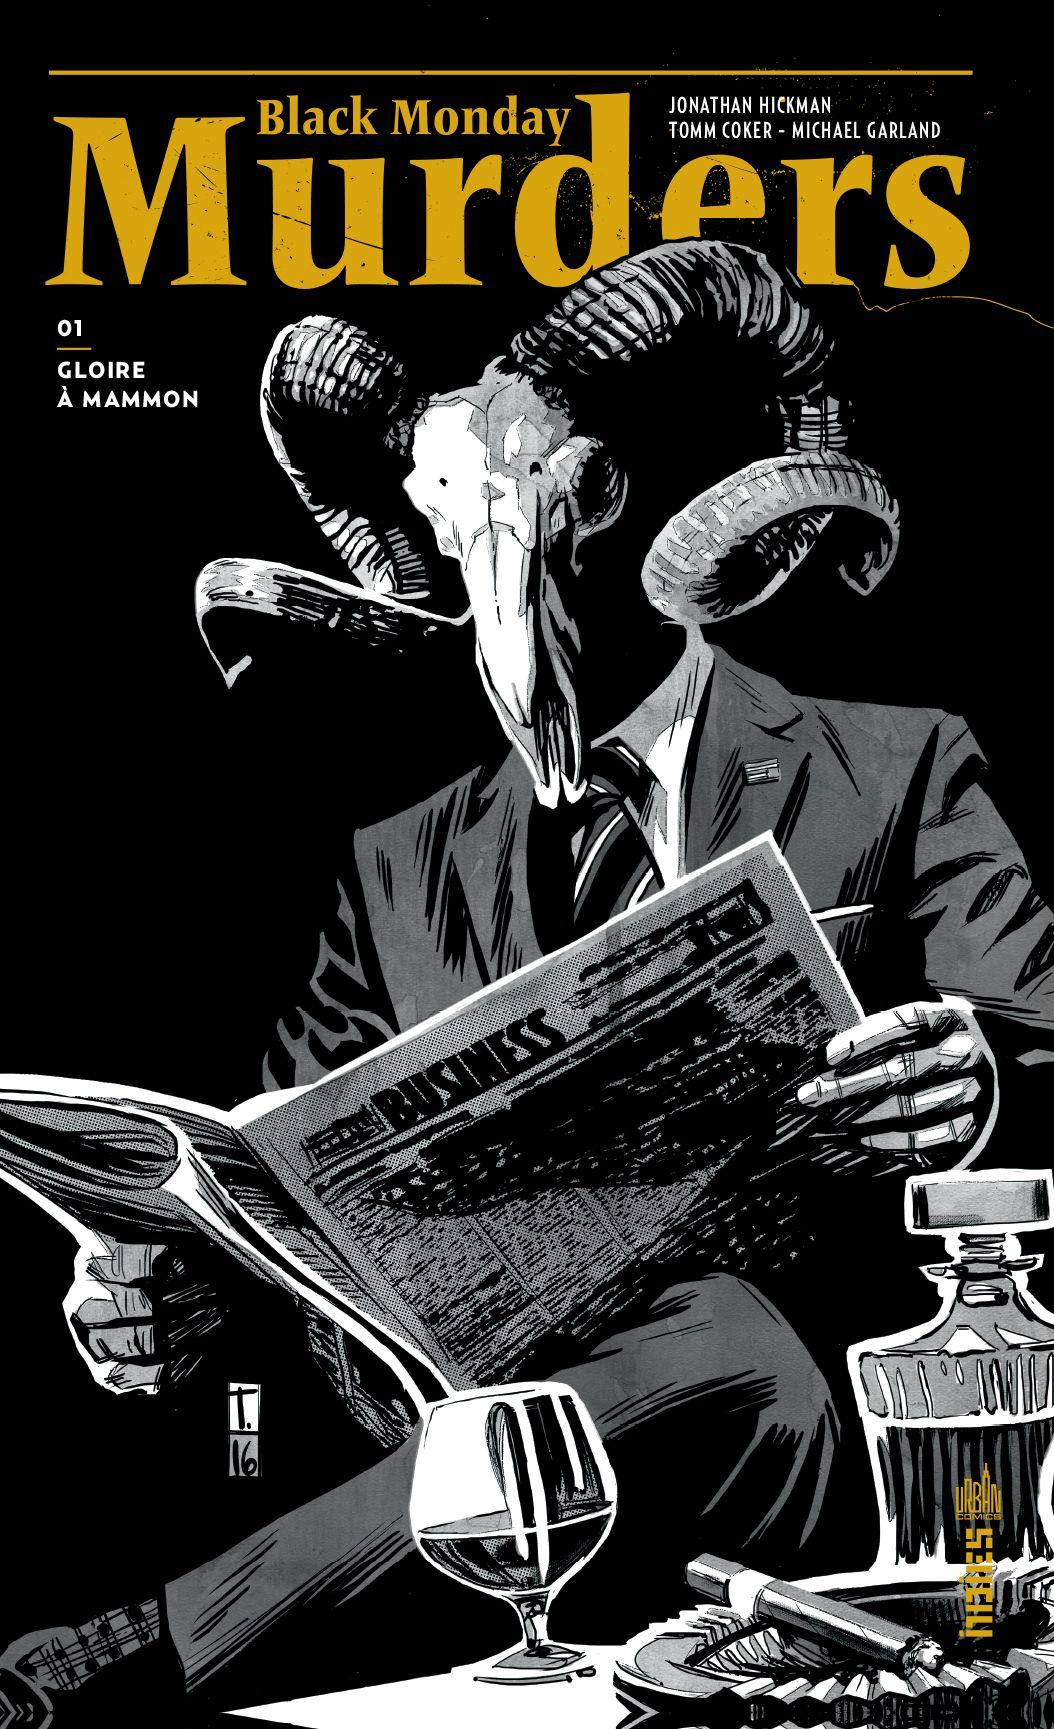 the-black-monday-murders-comics-volume-1-tpb-hardcover-cartonnee-301456.jpg